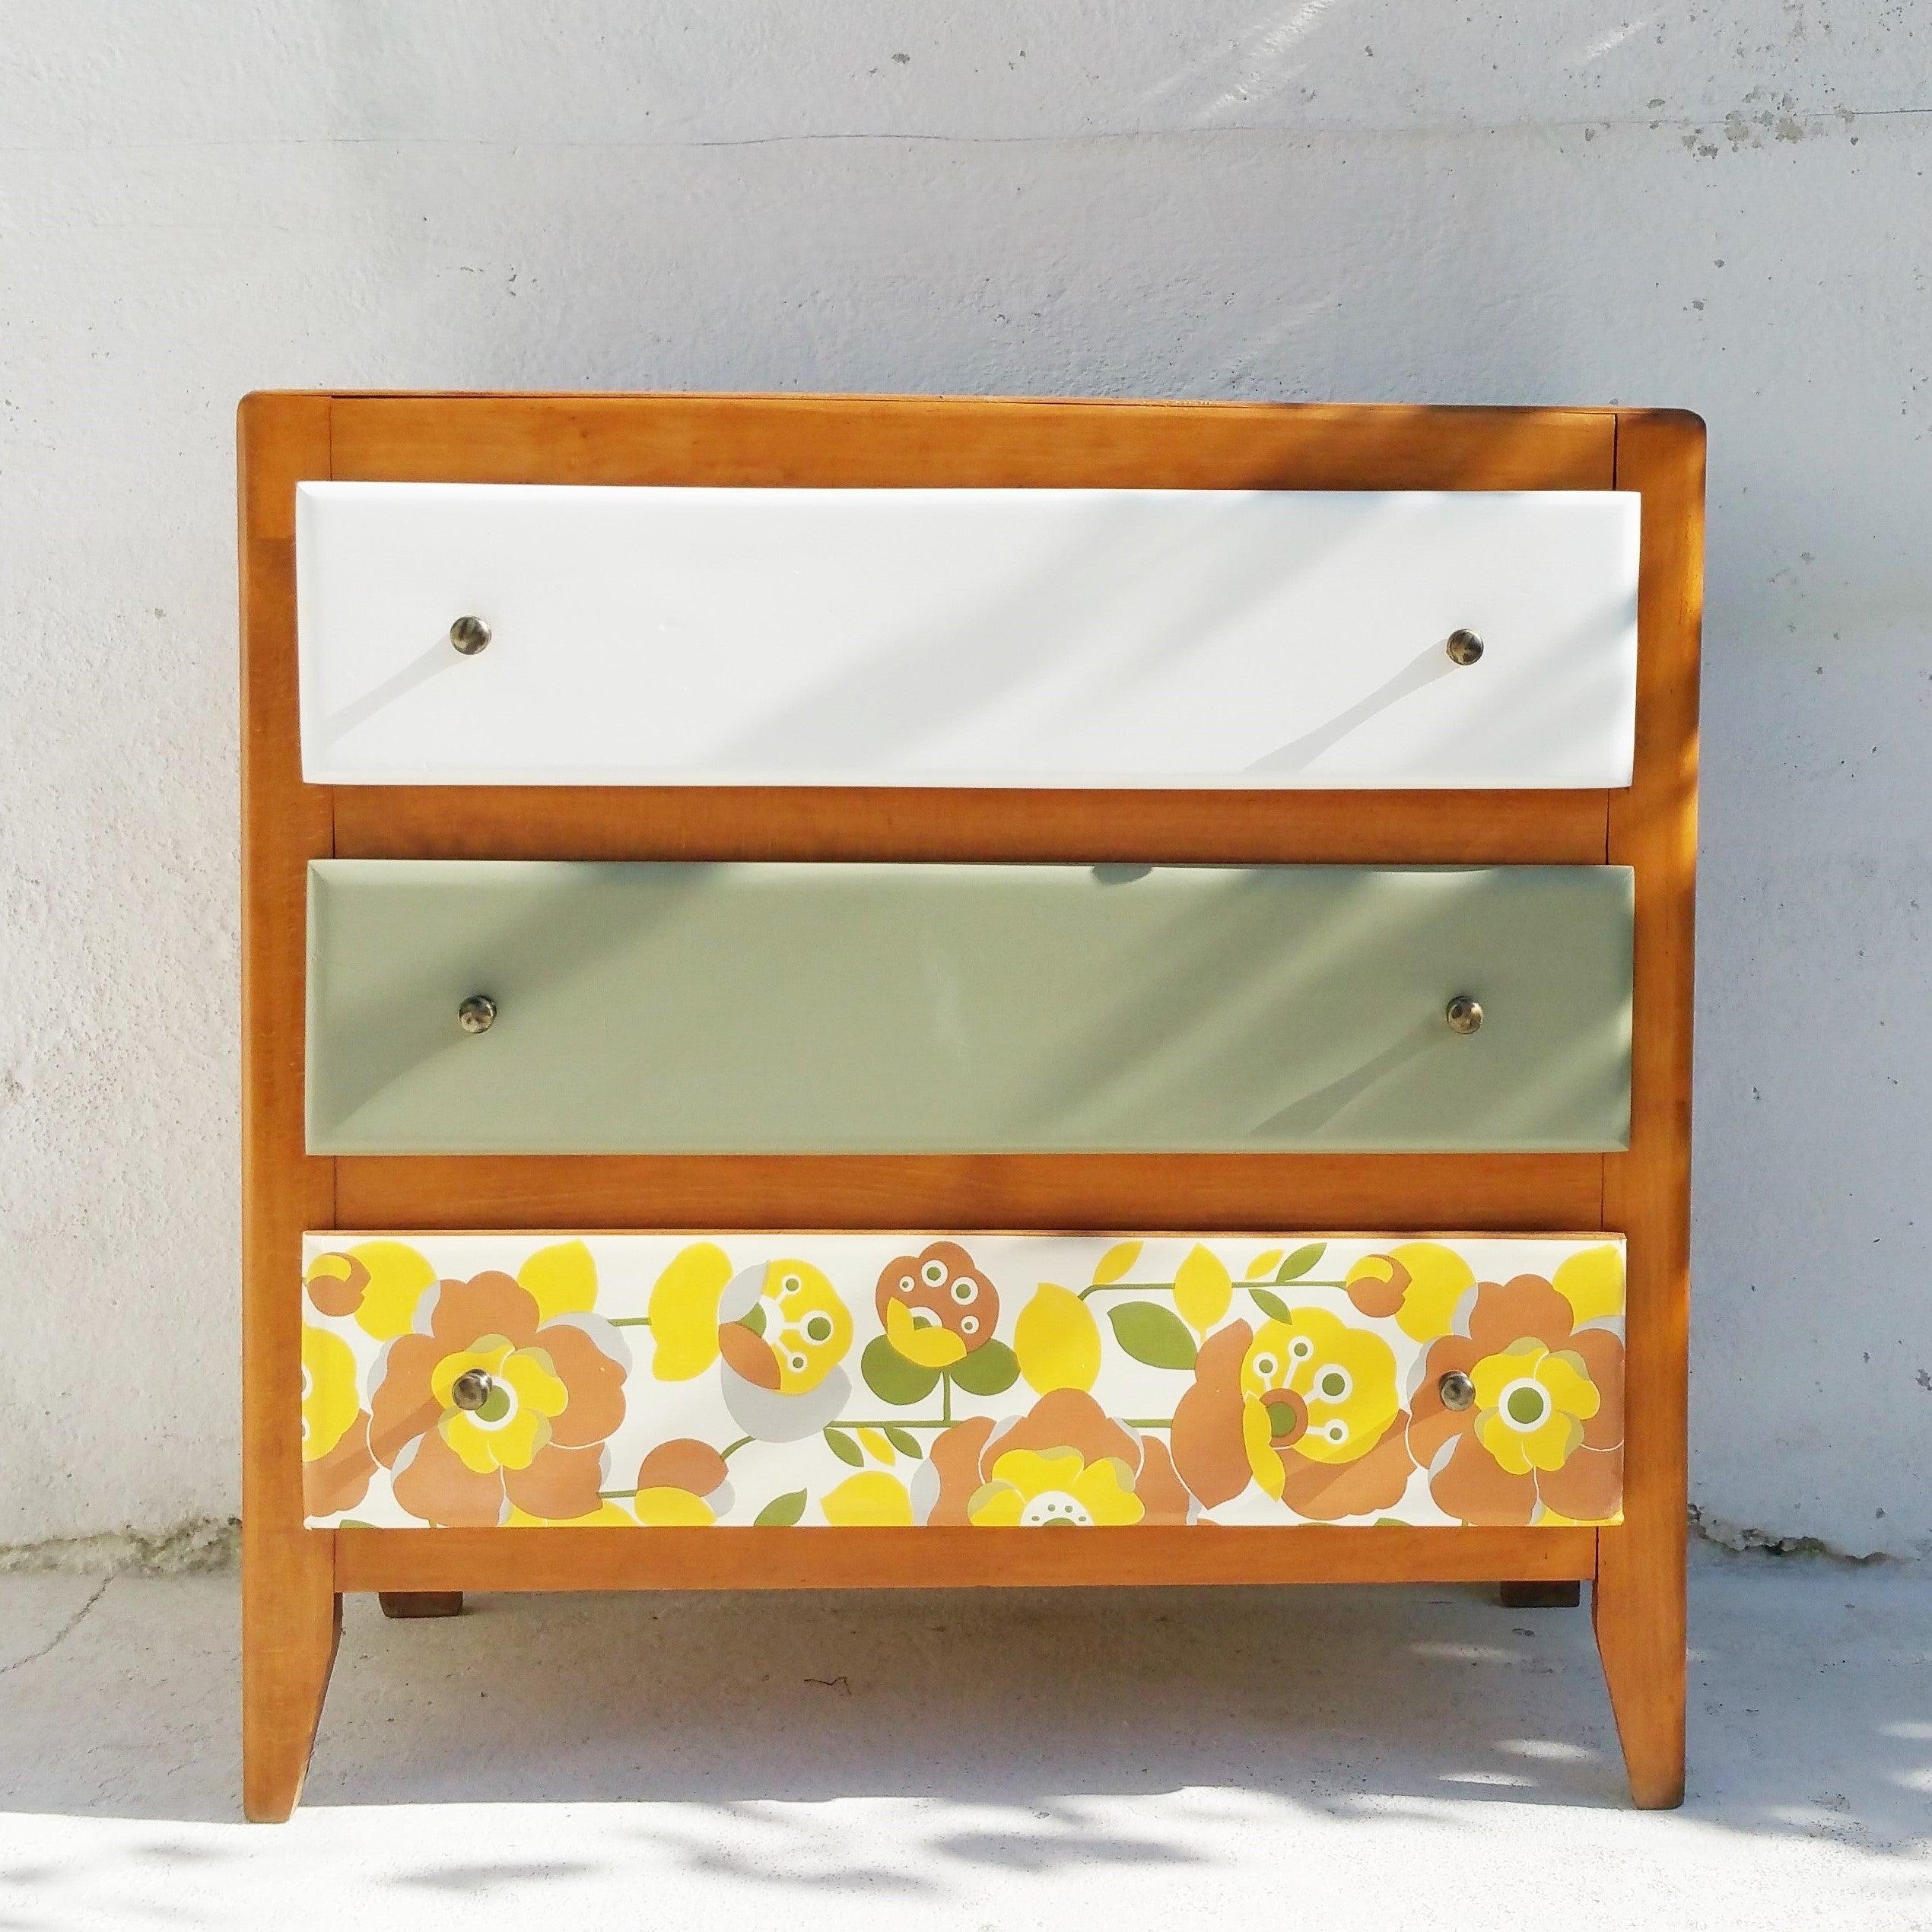 Commode chambre enfant-Vintage / fibresendeco - vannerie ... - Chambre Enfant Vintage